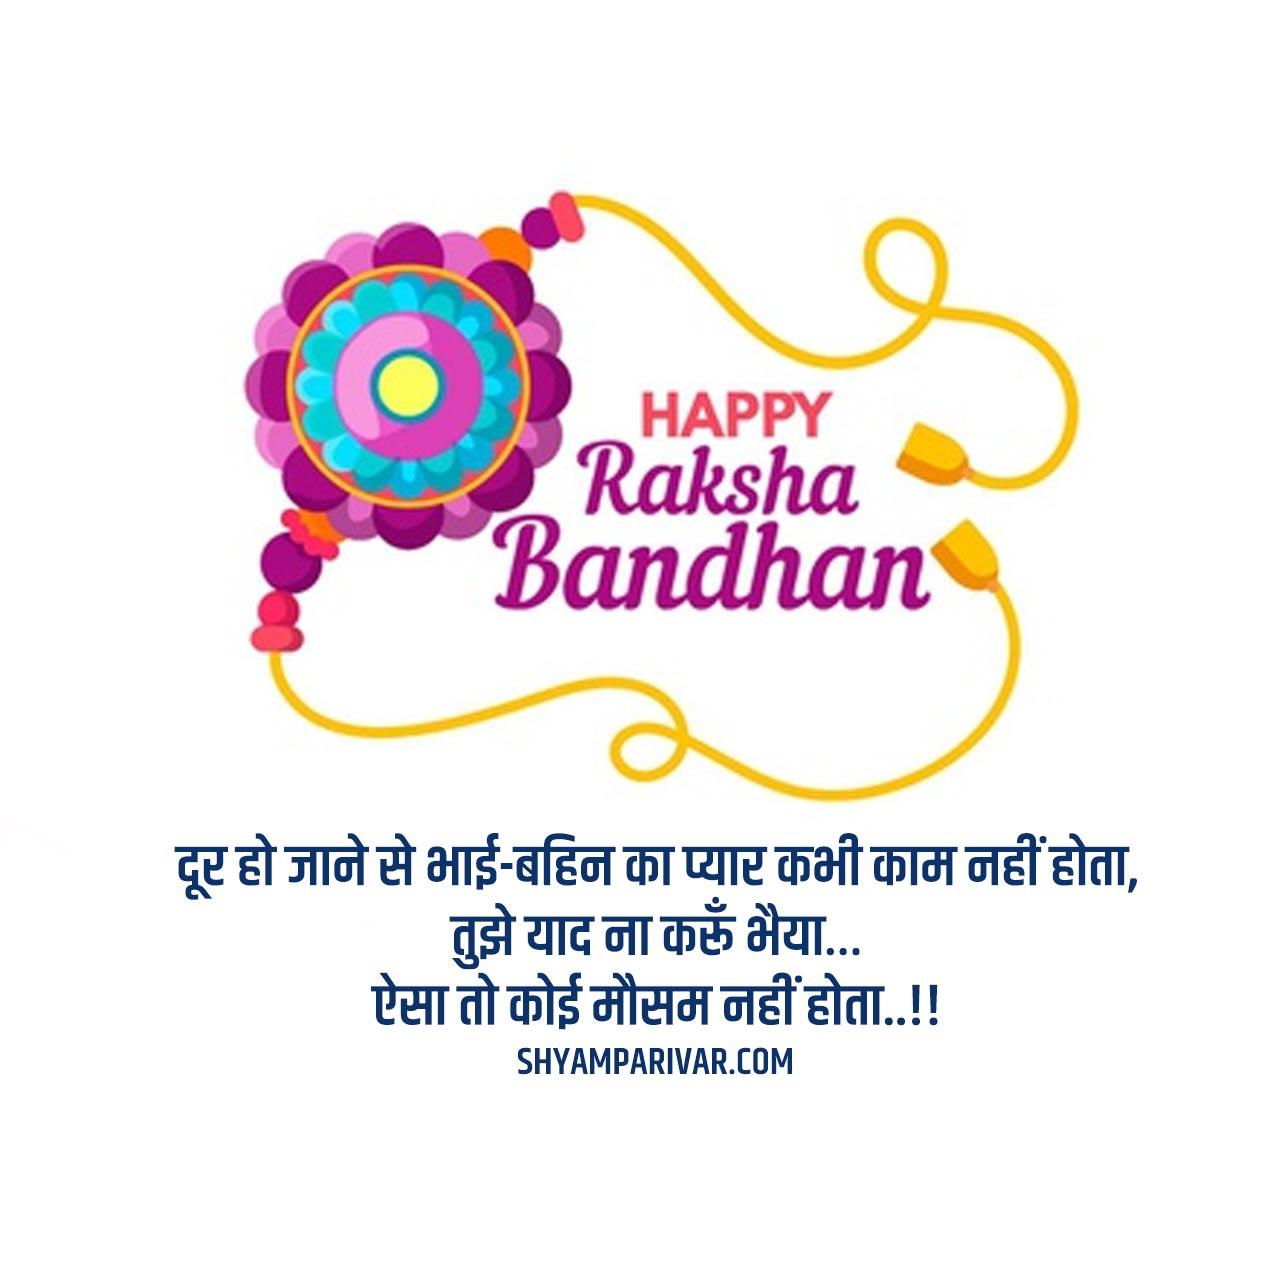 Happy raksha bandhan image with quote